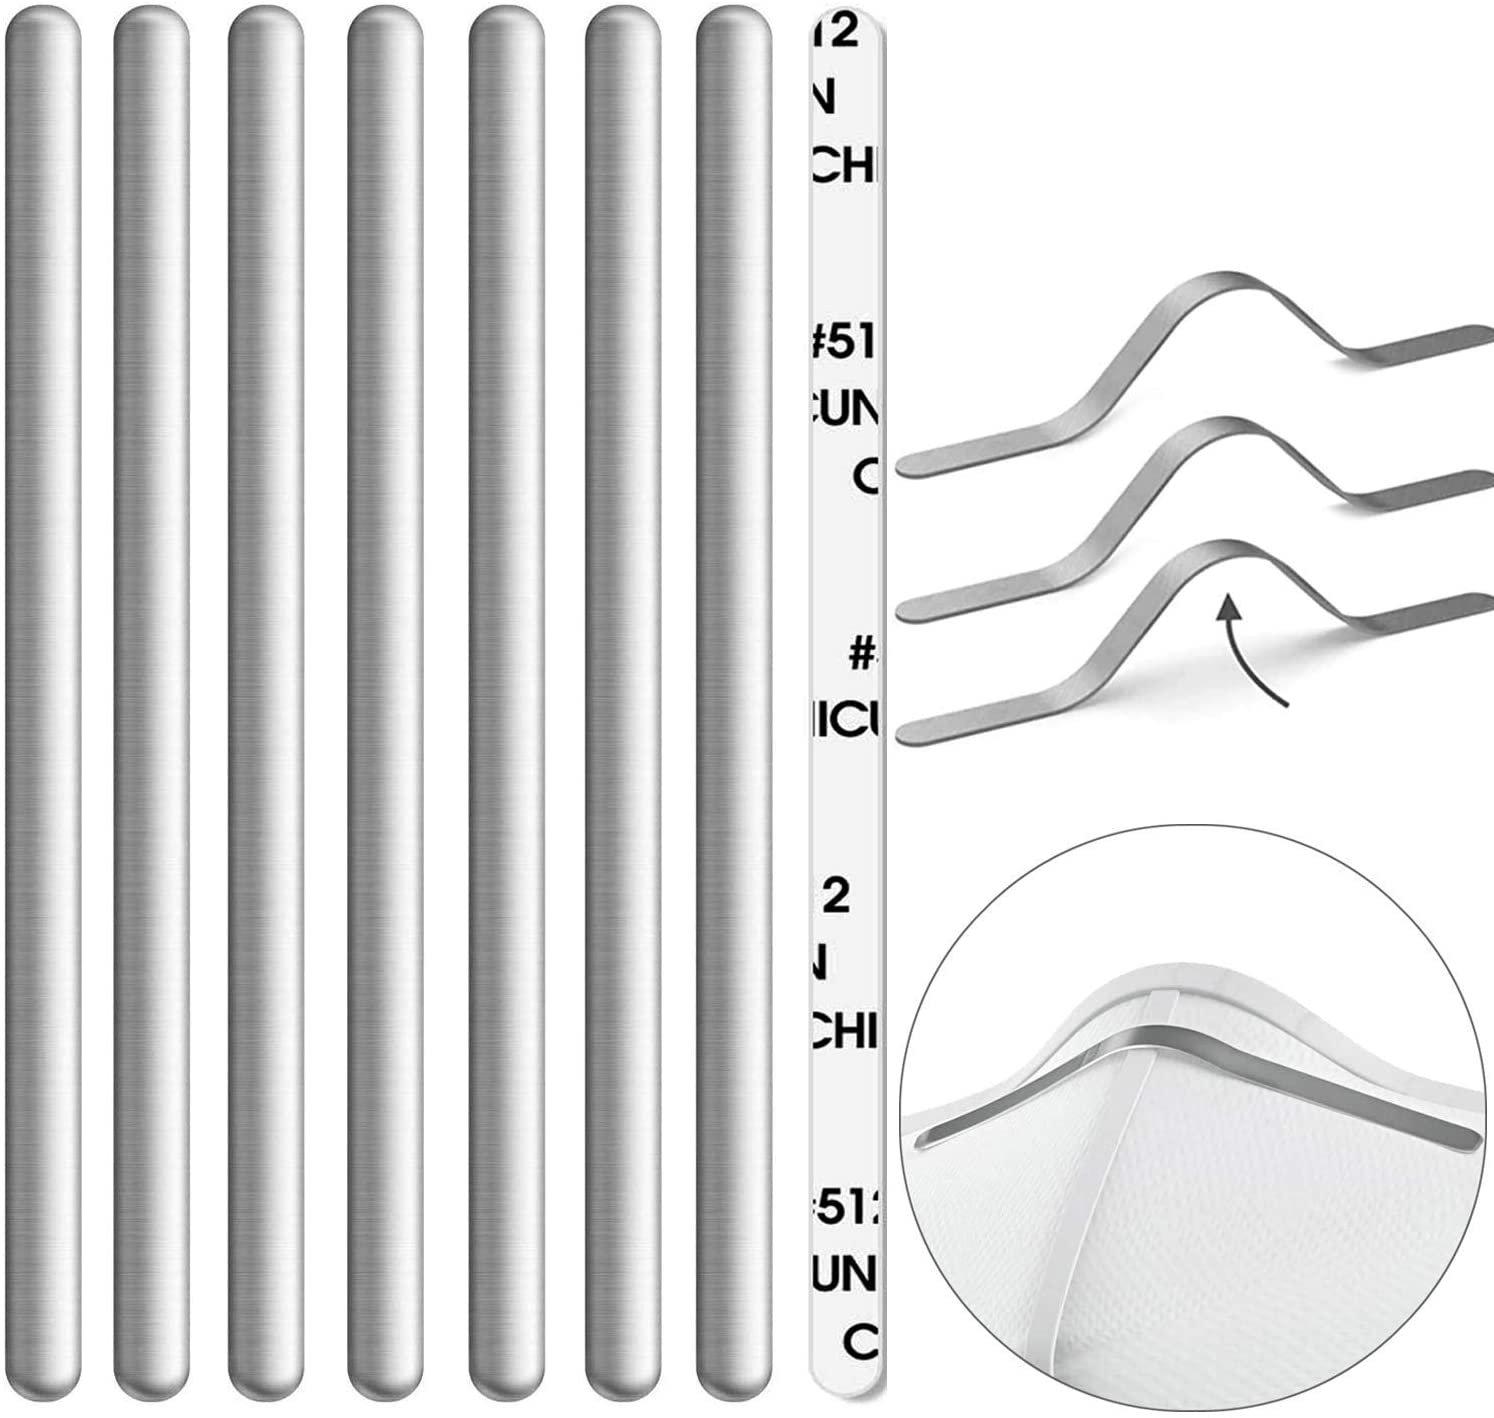 Aluminum Metal Nose Bridge Ties Wires Bendable Twist With Adhesive Back 85x5mm